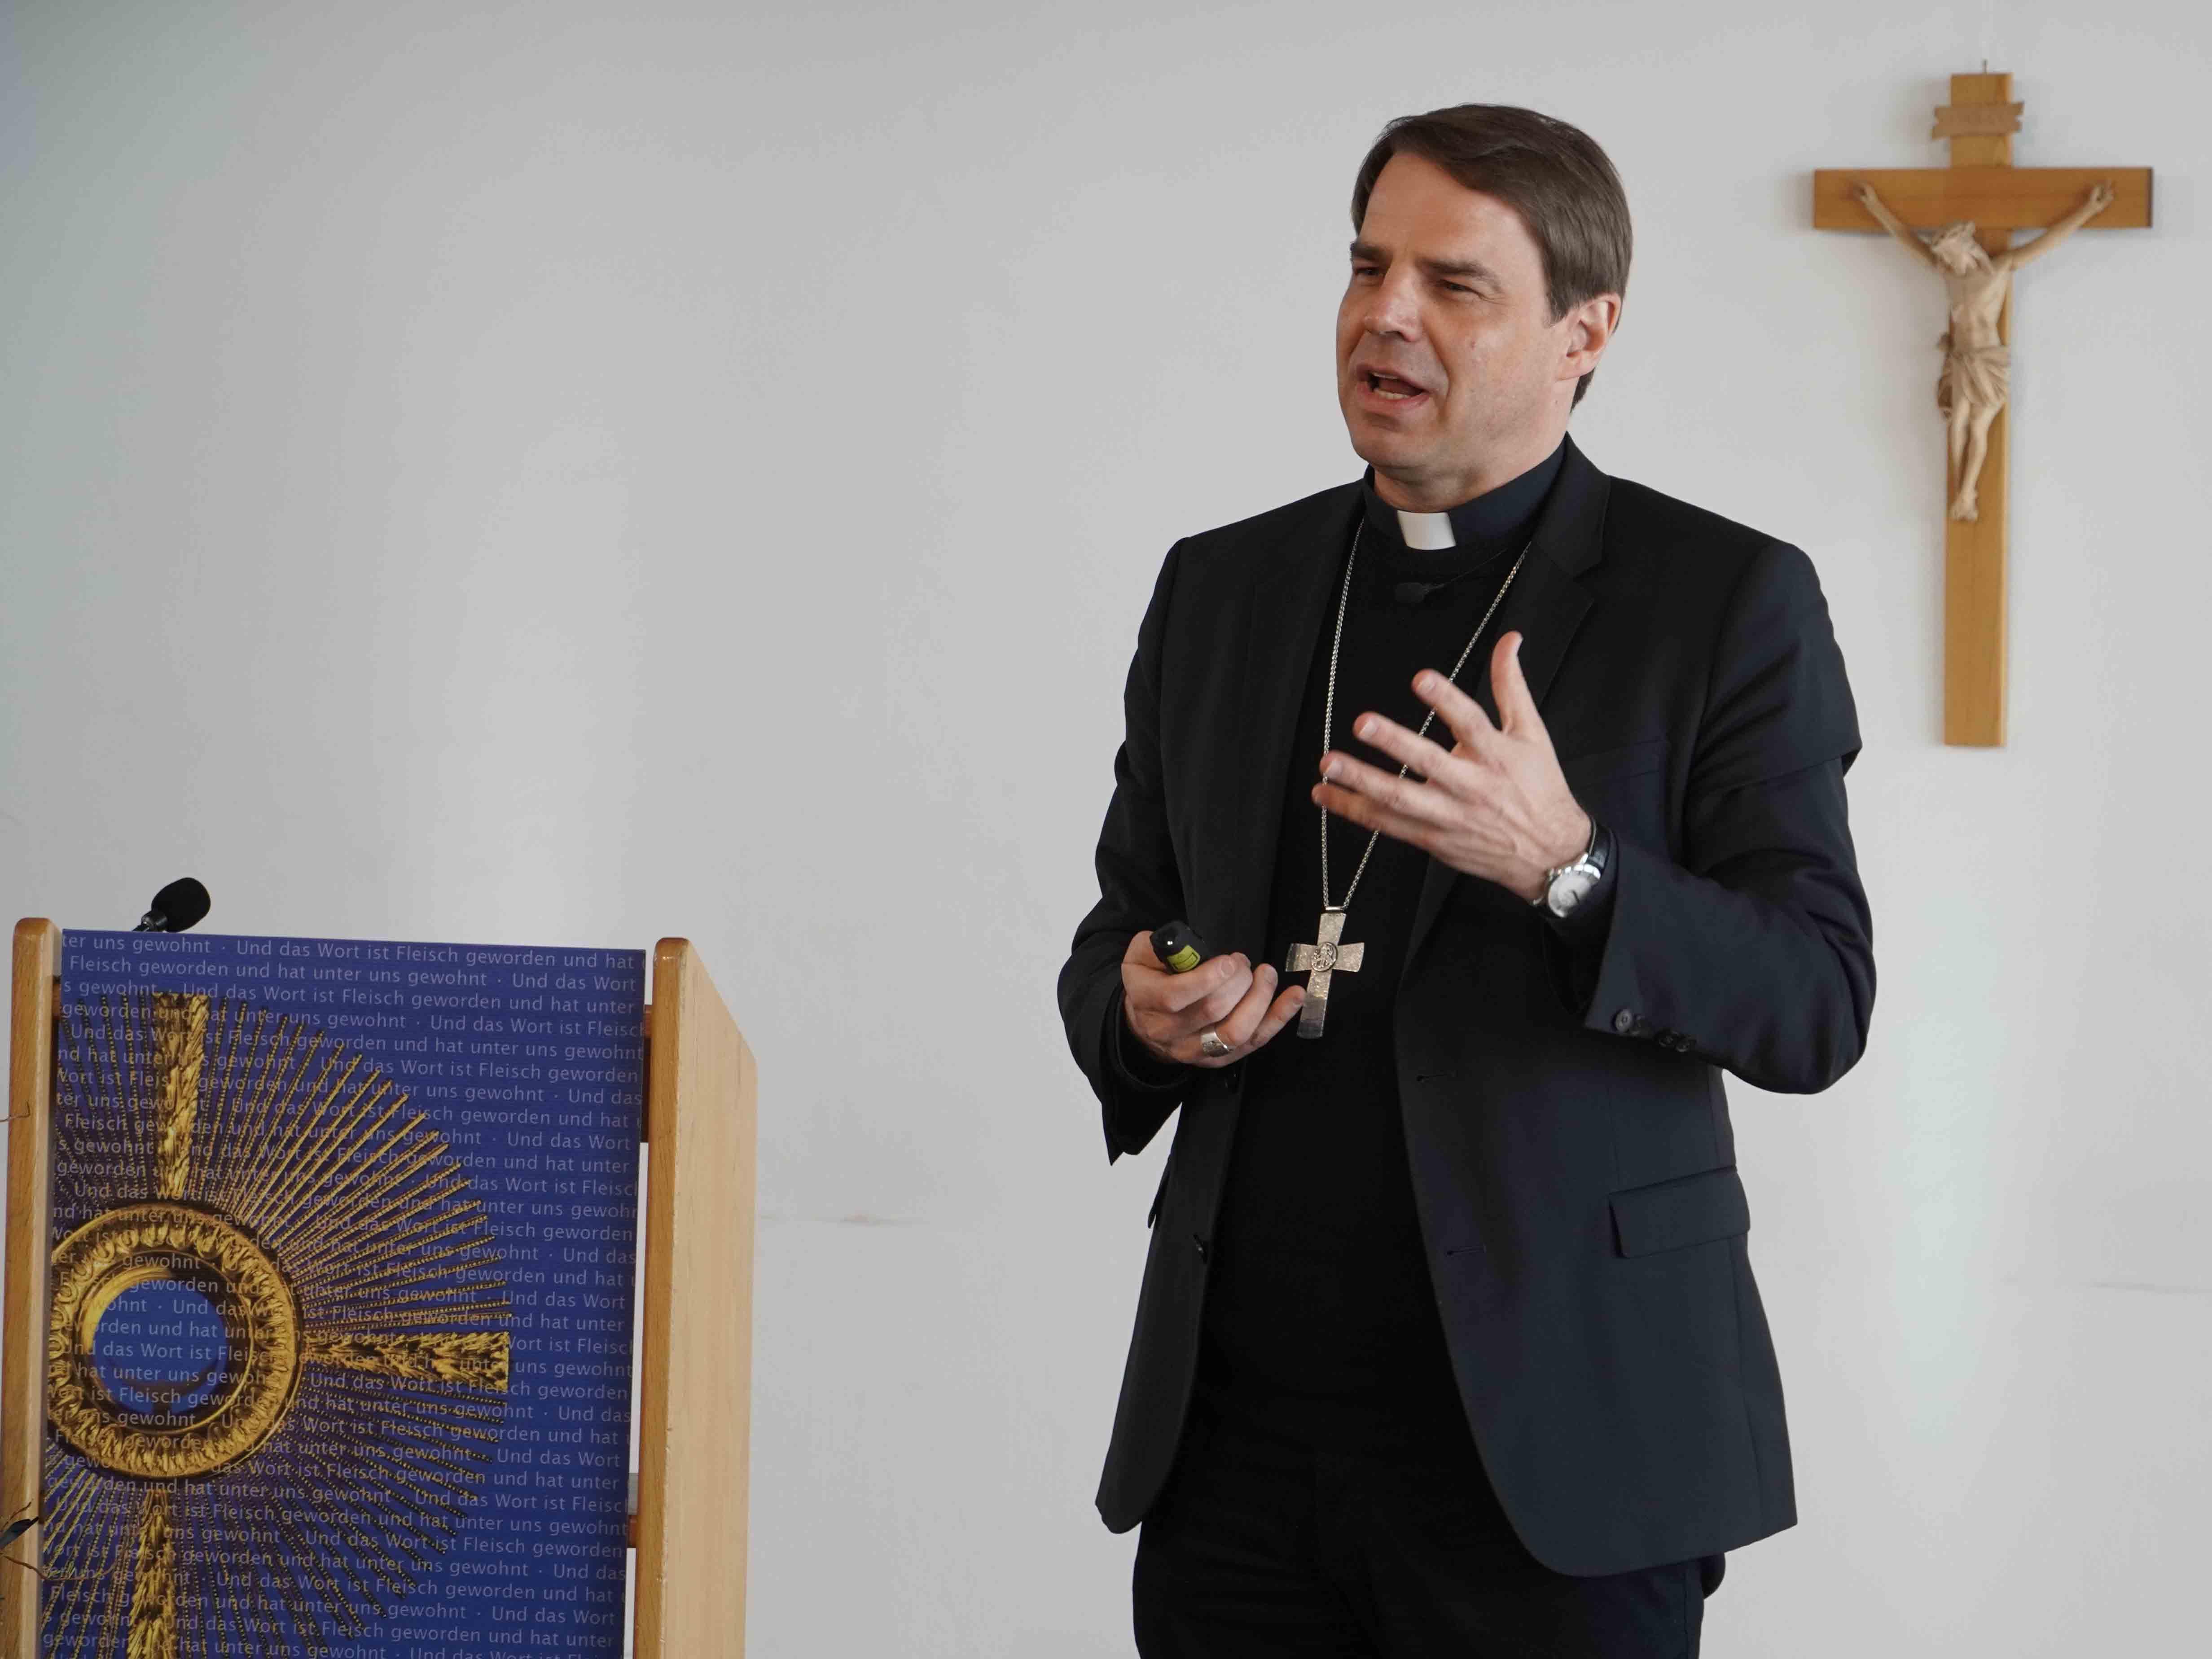 Bischof Dr. Stefan Oster beim digitalen Studientag in Augsburg. (Foto: Jonathan Huber)